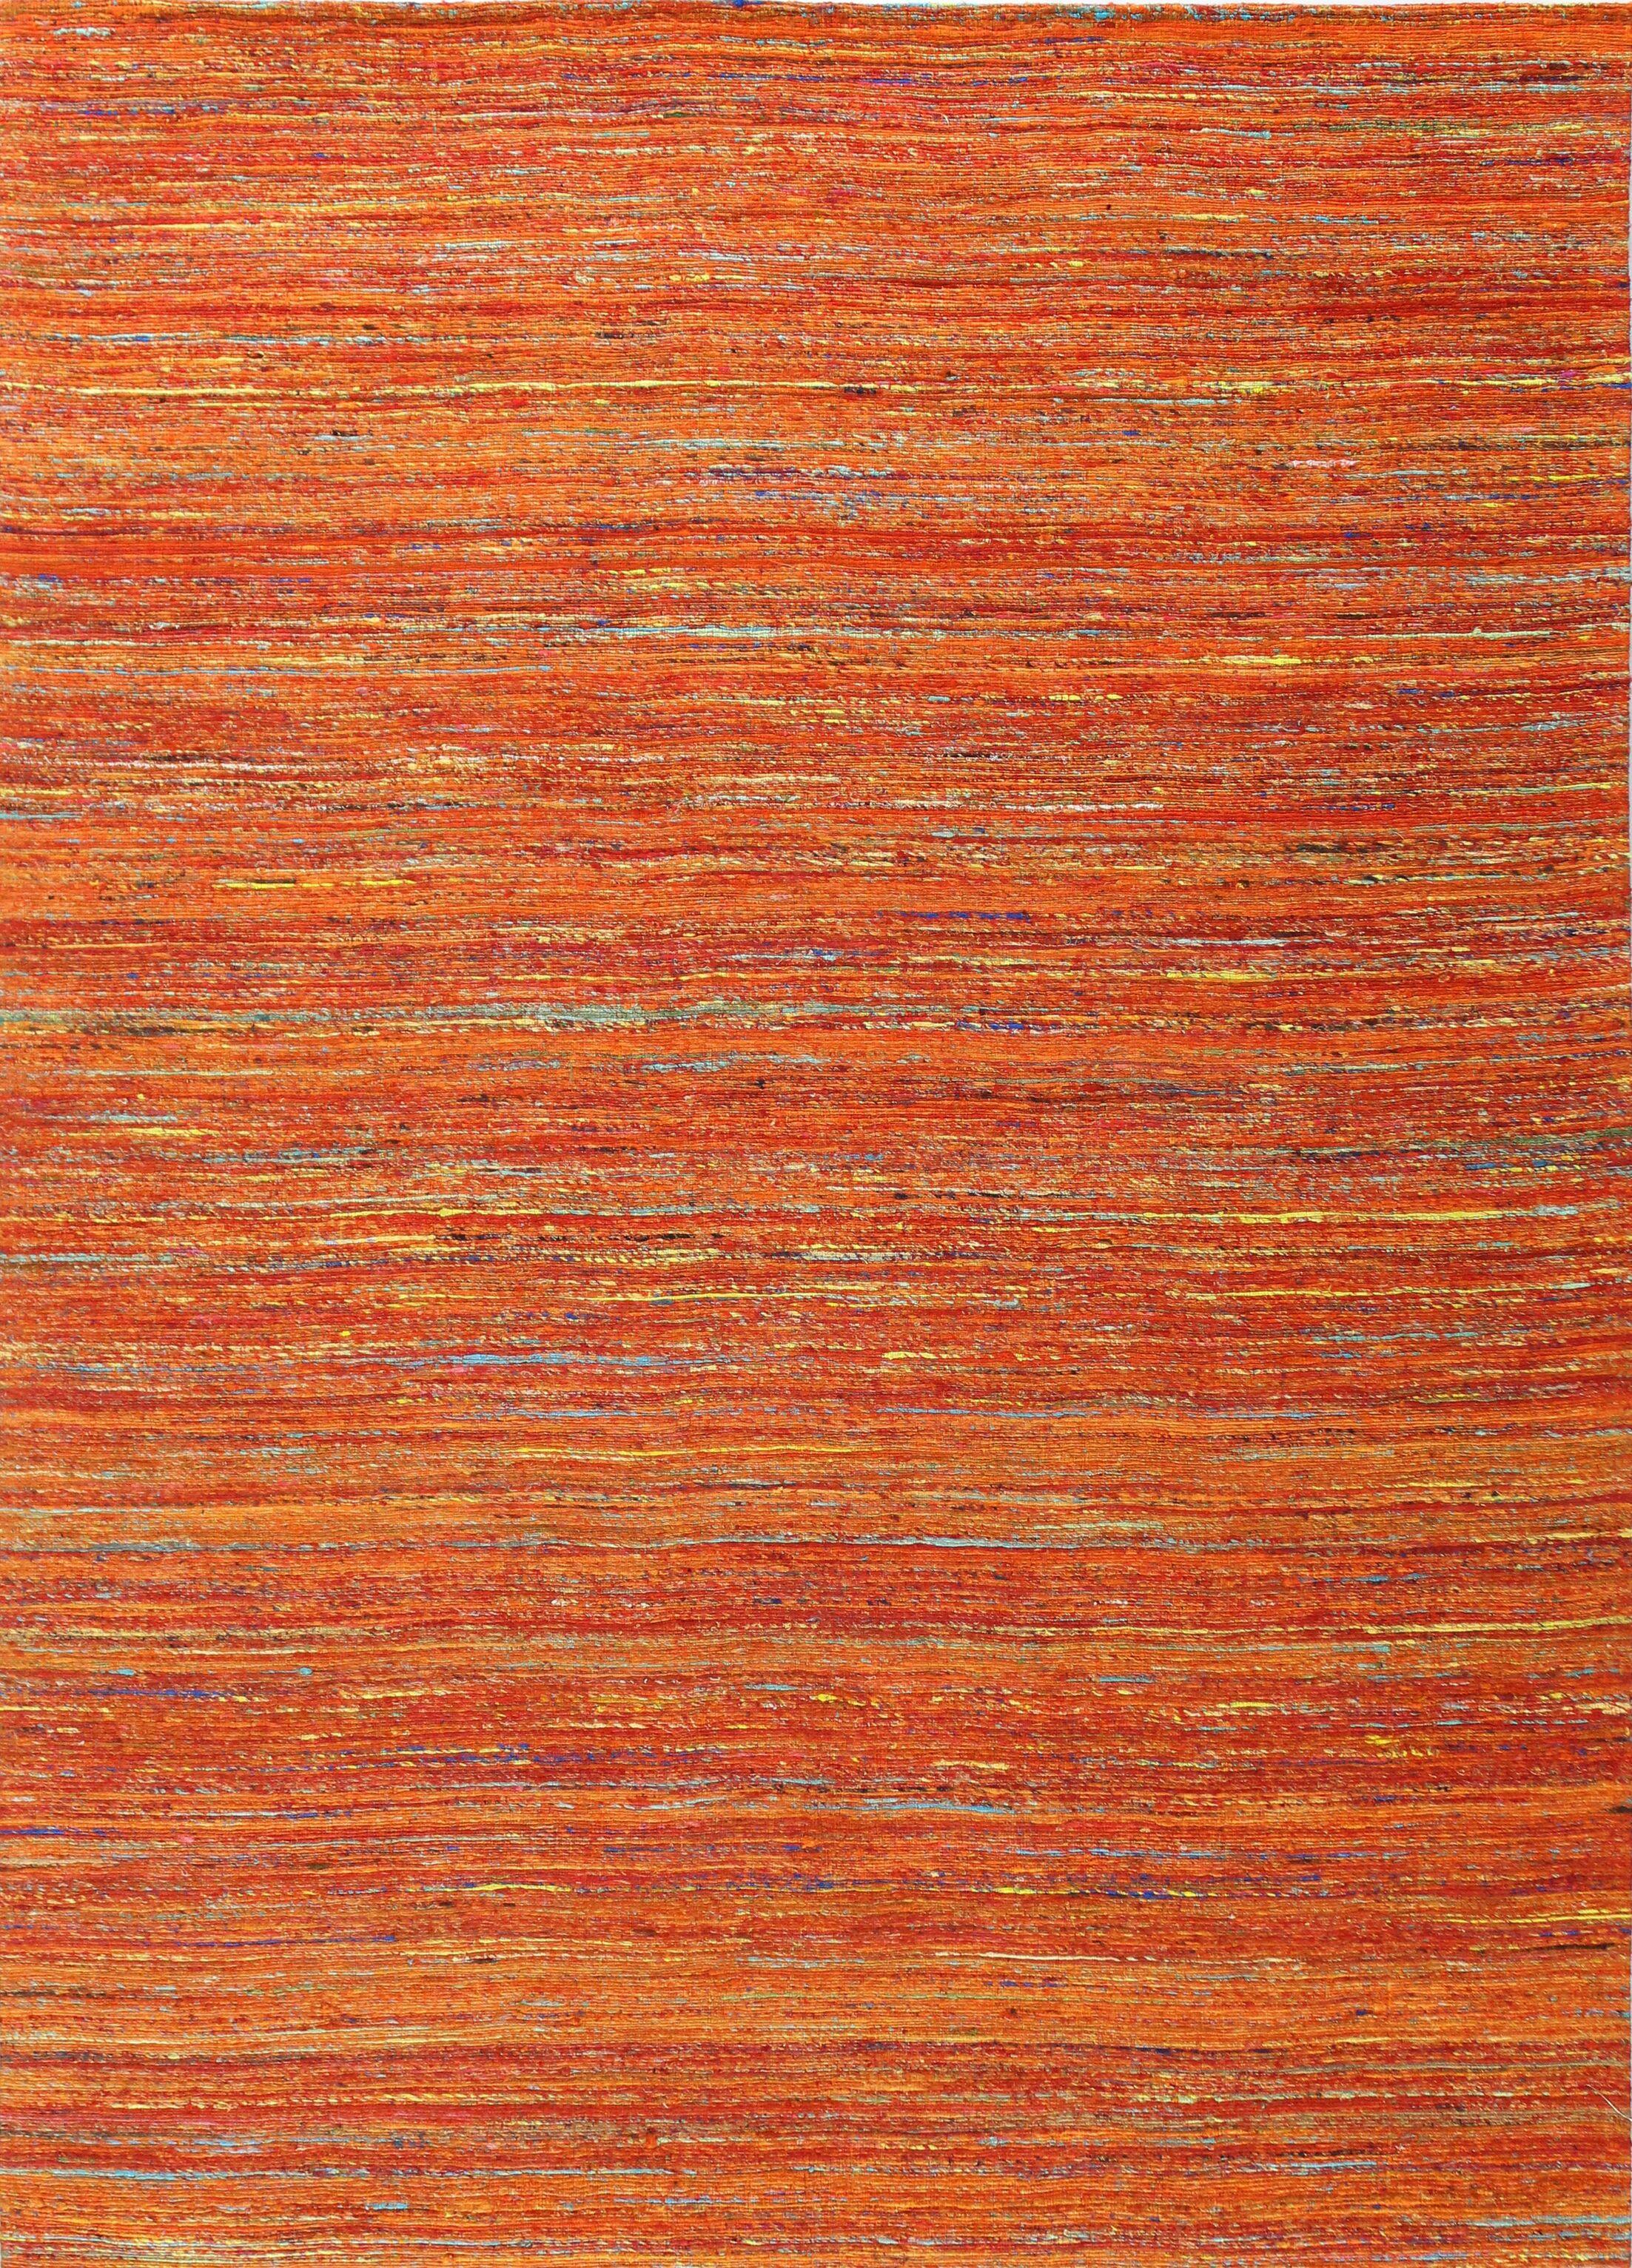 Fagan Hand Woven Sunset Area Rug Rug Size: Rectangle 5'9